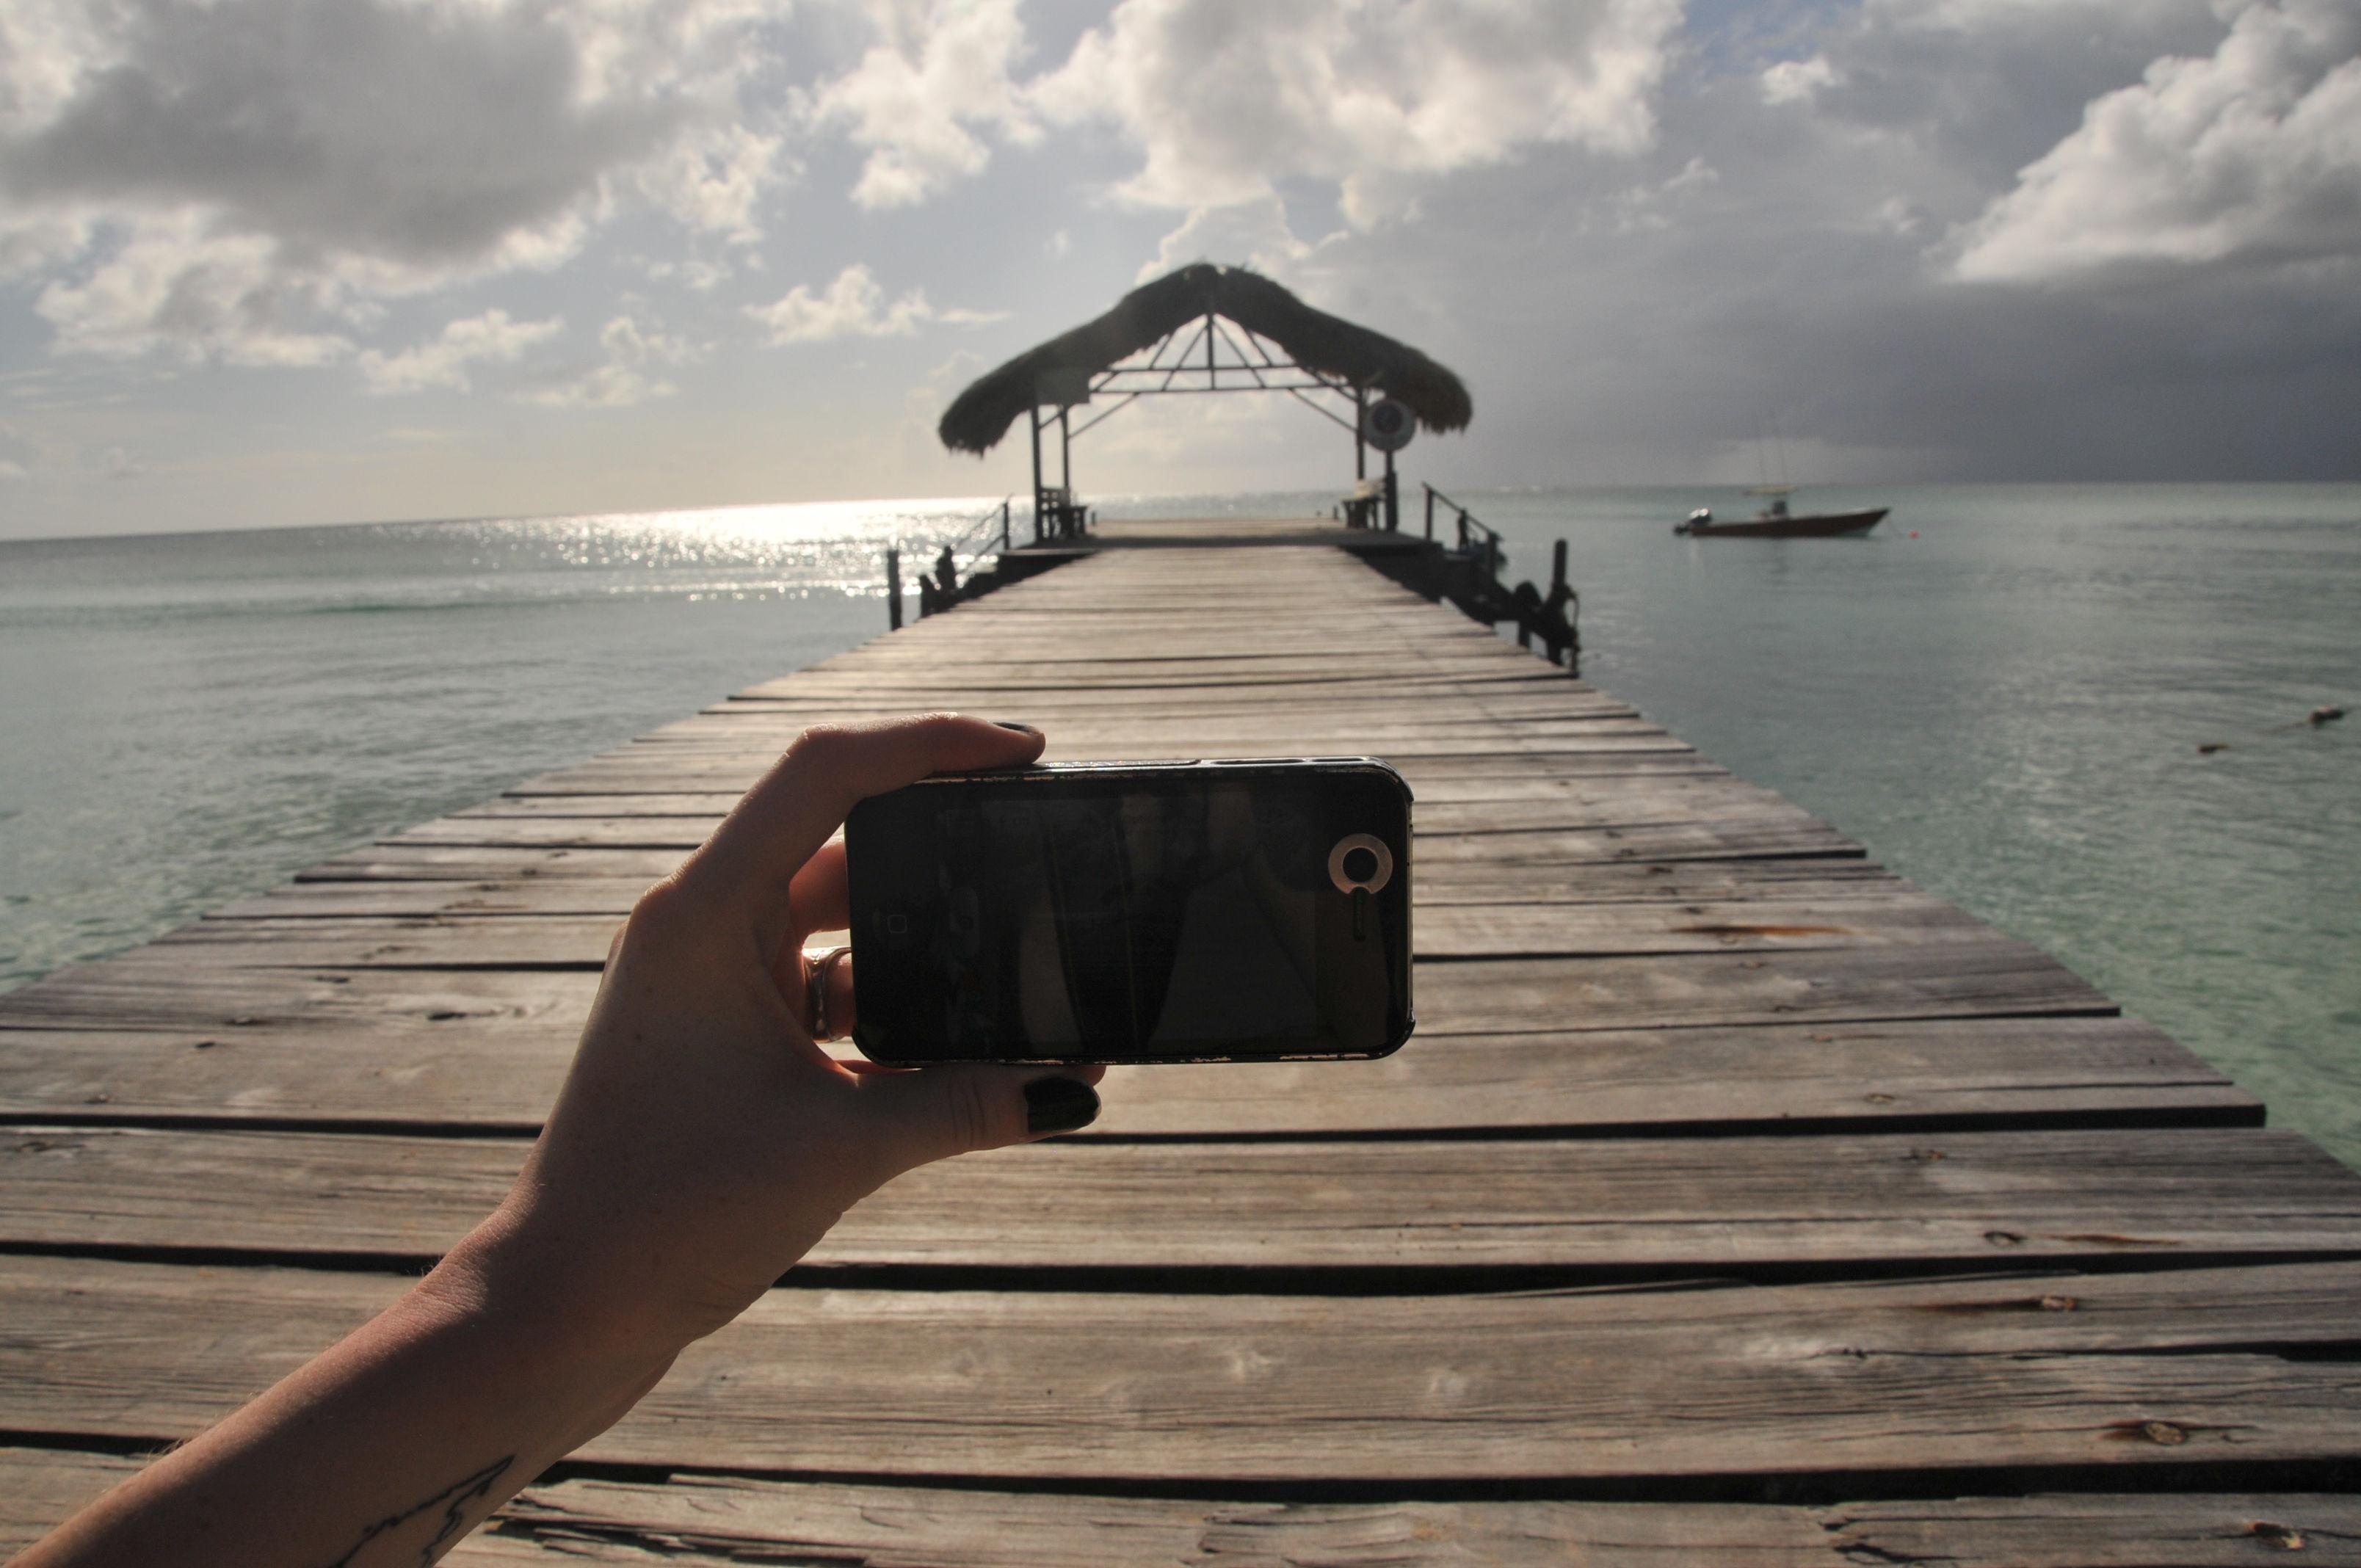 http://www.telefonguru.hu/images/content/SEA_0660.jpg